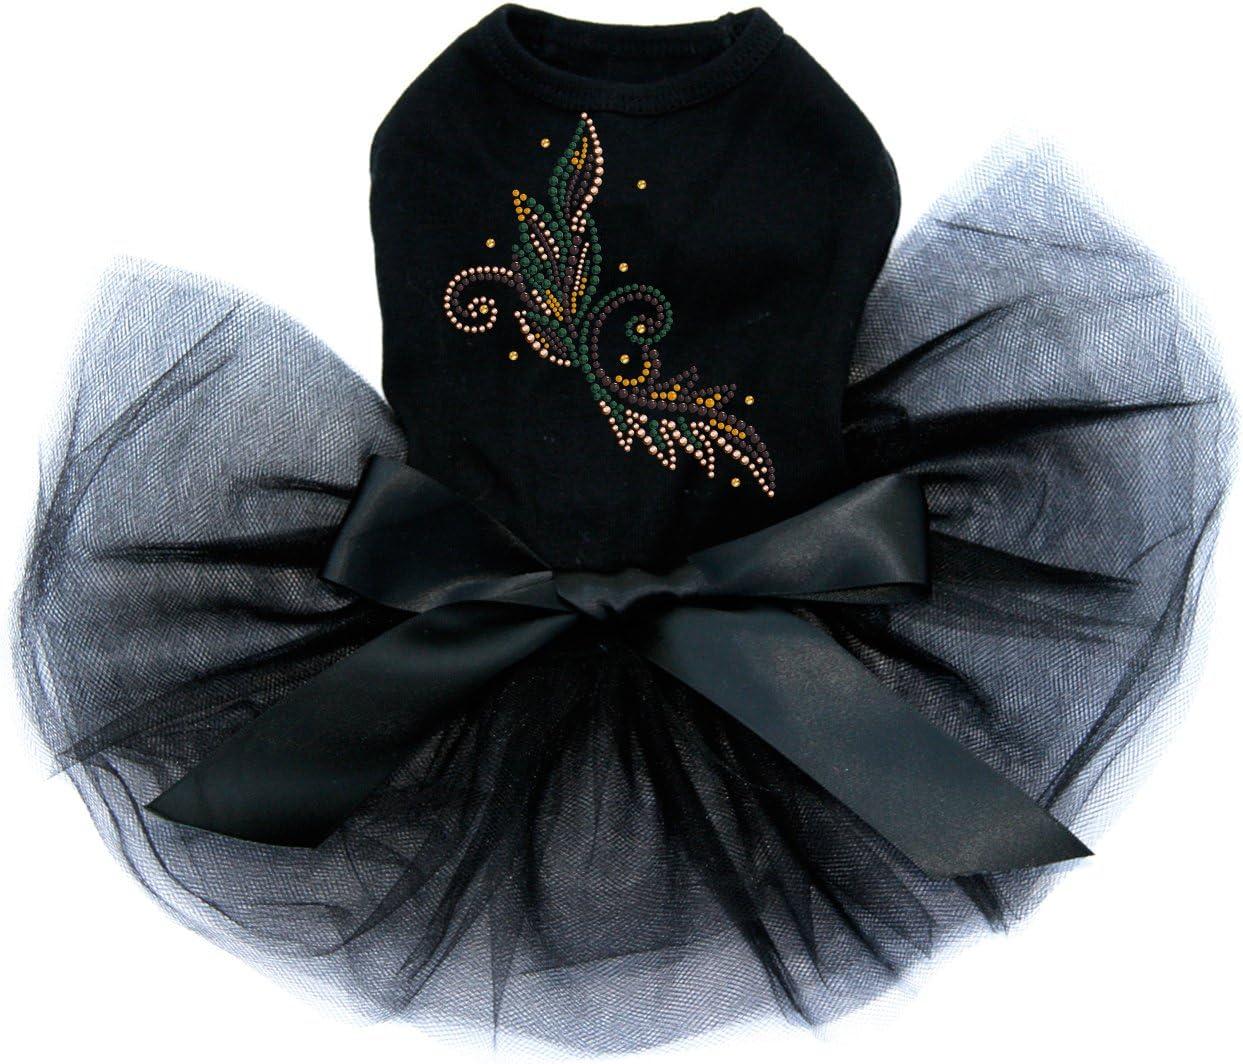 Fall Leaves 2021 spring and summer new Max 54% OFF # 2 - Bling Tutu Rhinestone Black XL Dog Dress